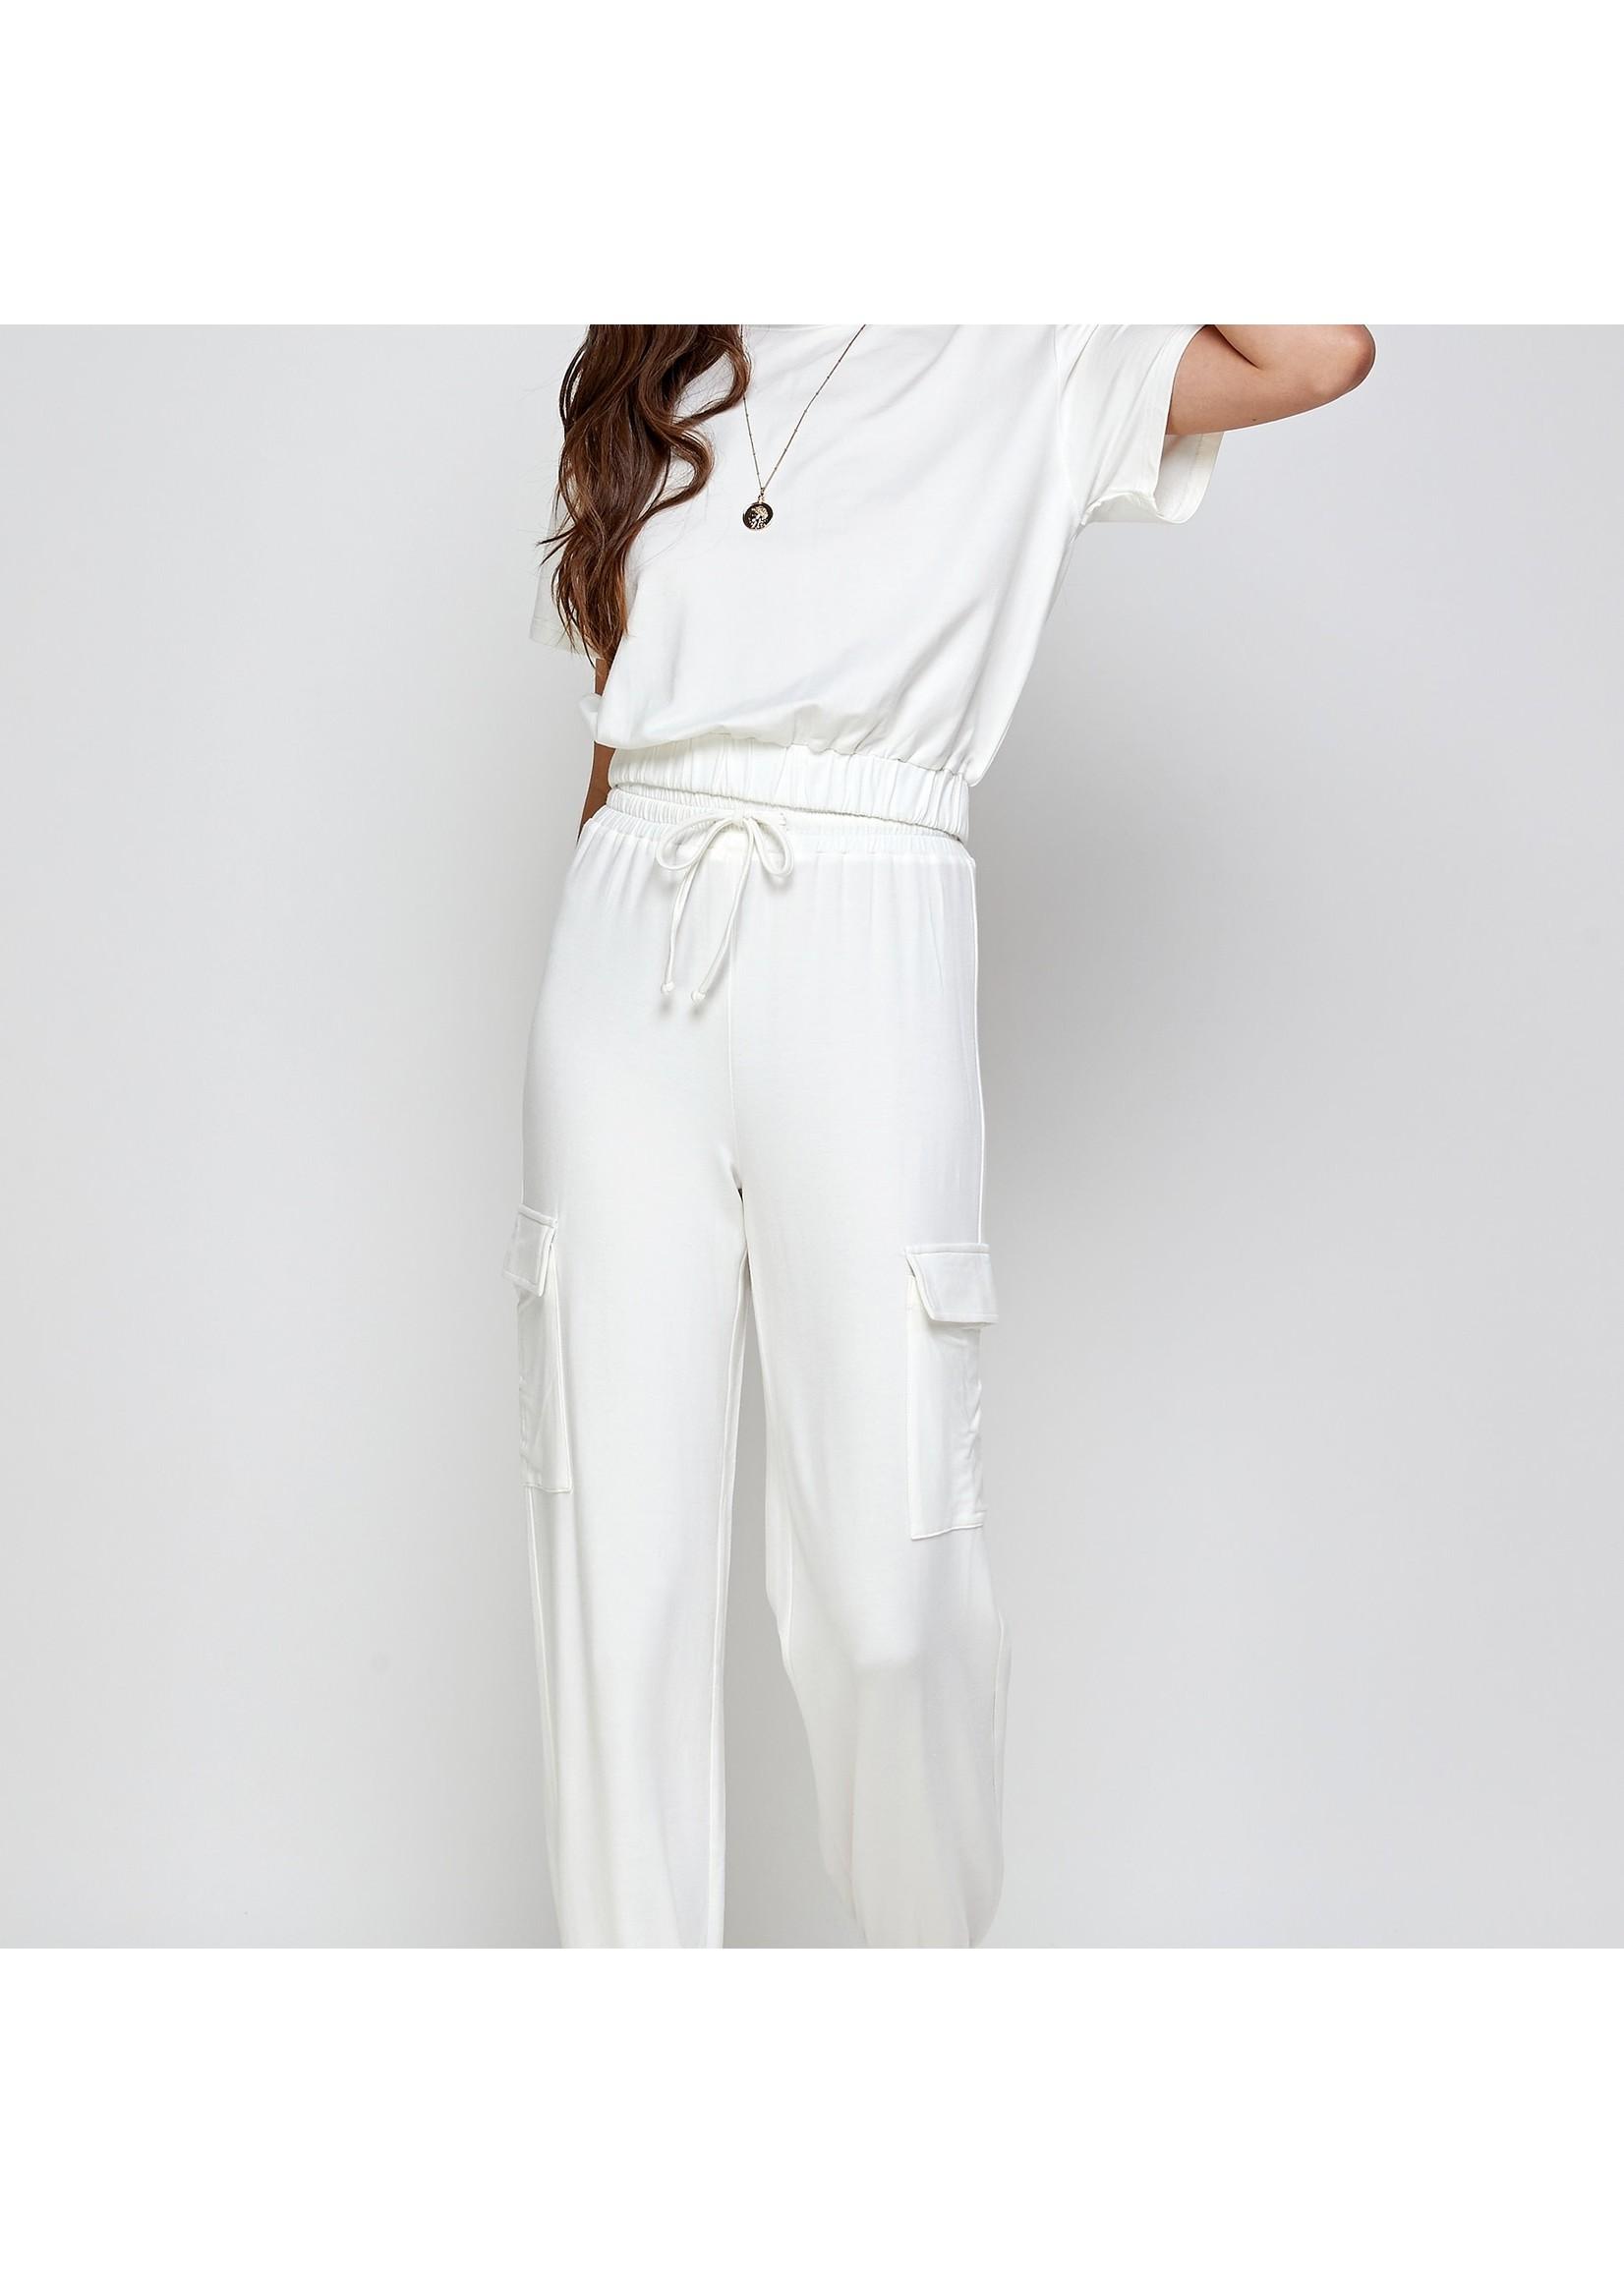 Ellison White Cargo Pants